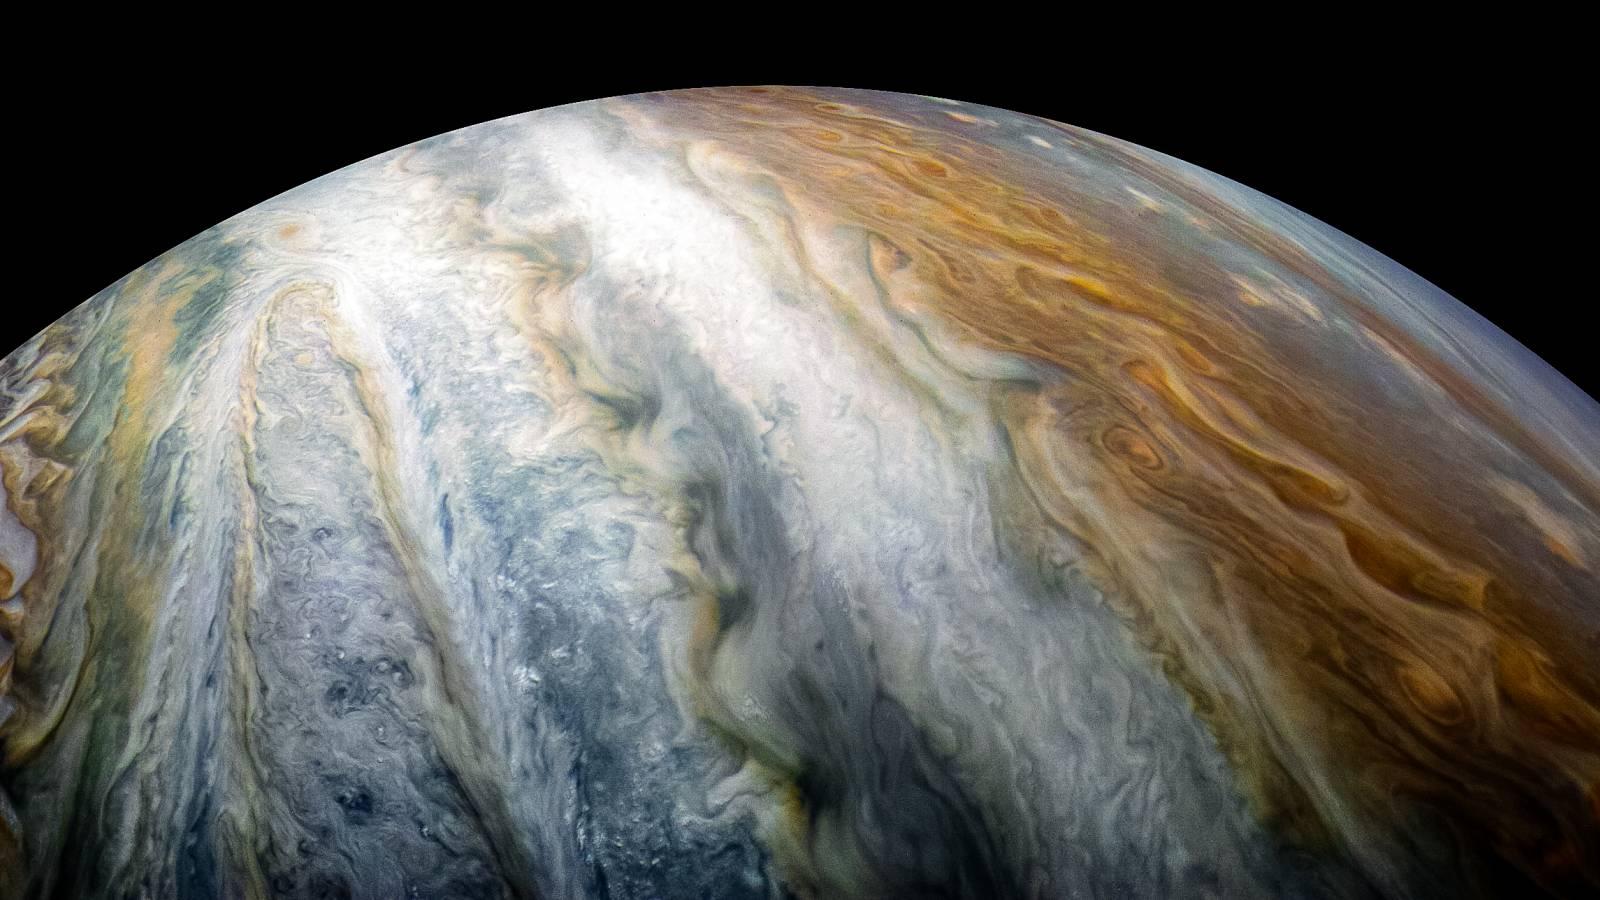 Planeta Jupiter Internetul SURPRINS de o INCREDIBILA Imagine